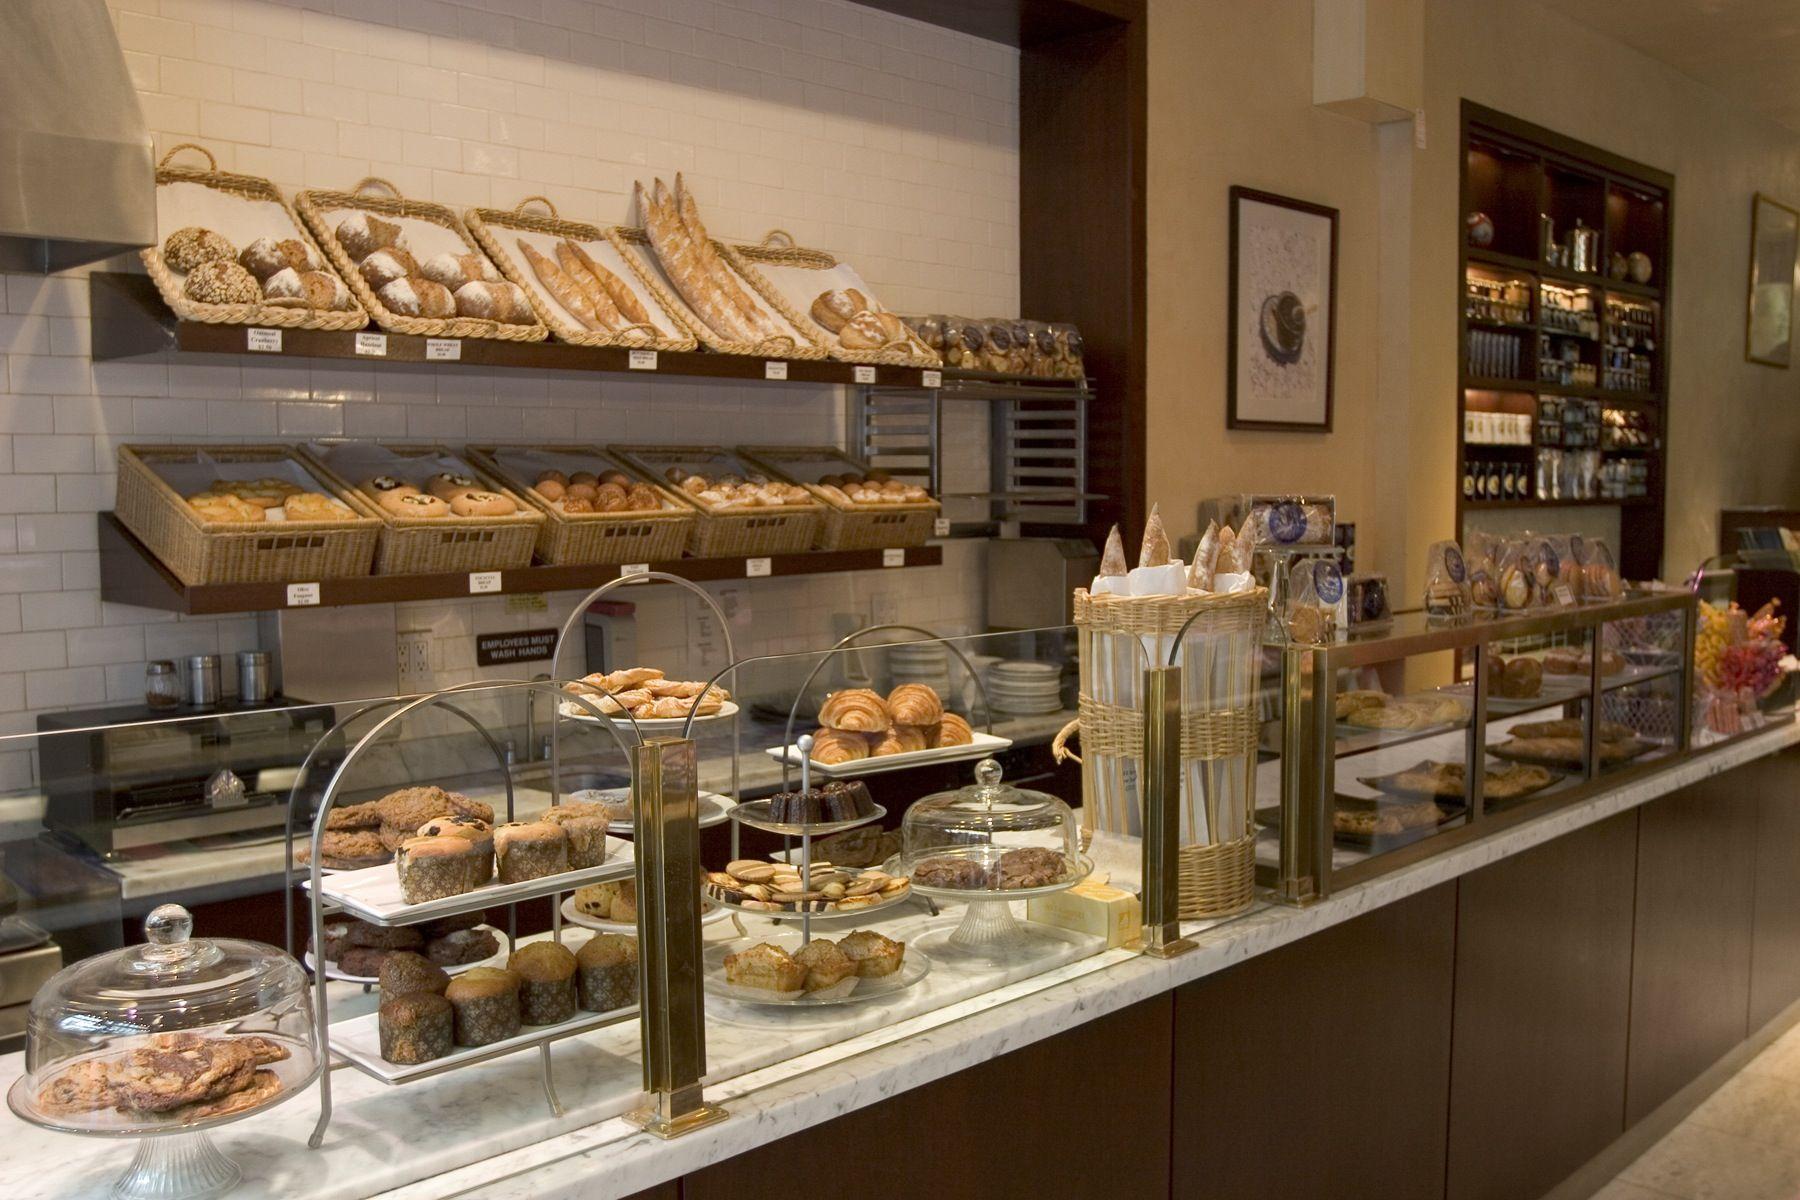 bakery shop - Google Search | Bakery | Pinterest | Bakeries and ...